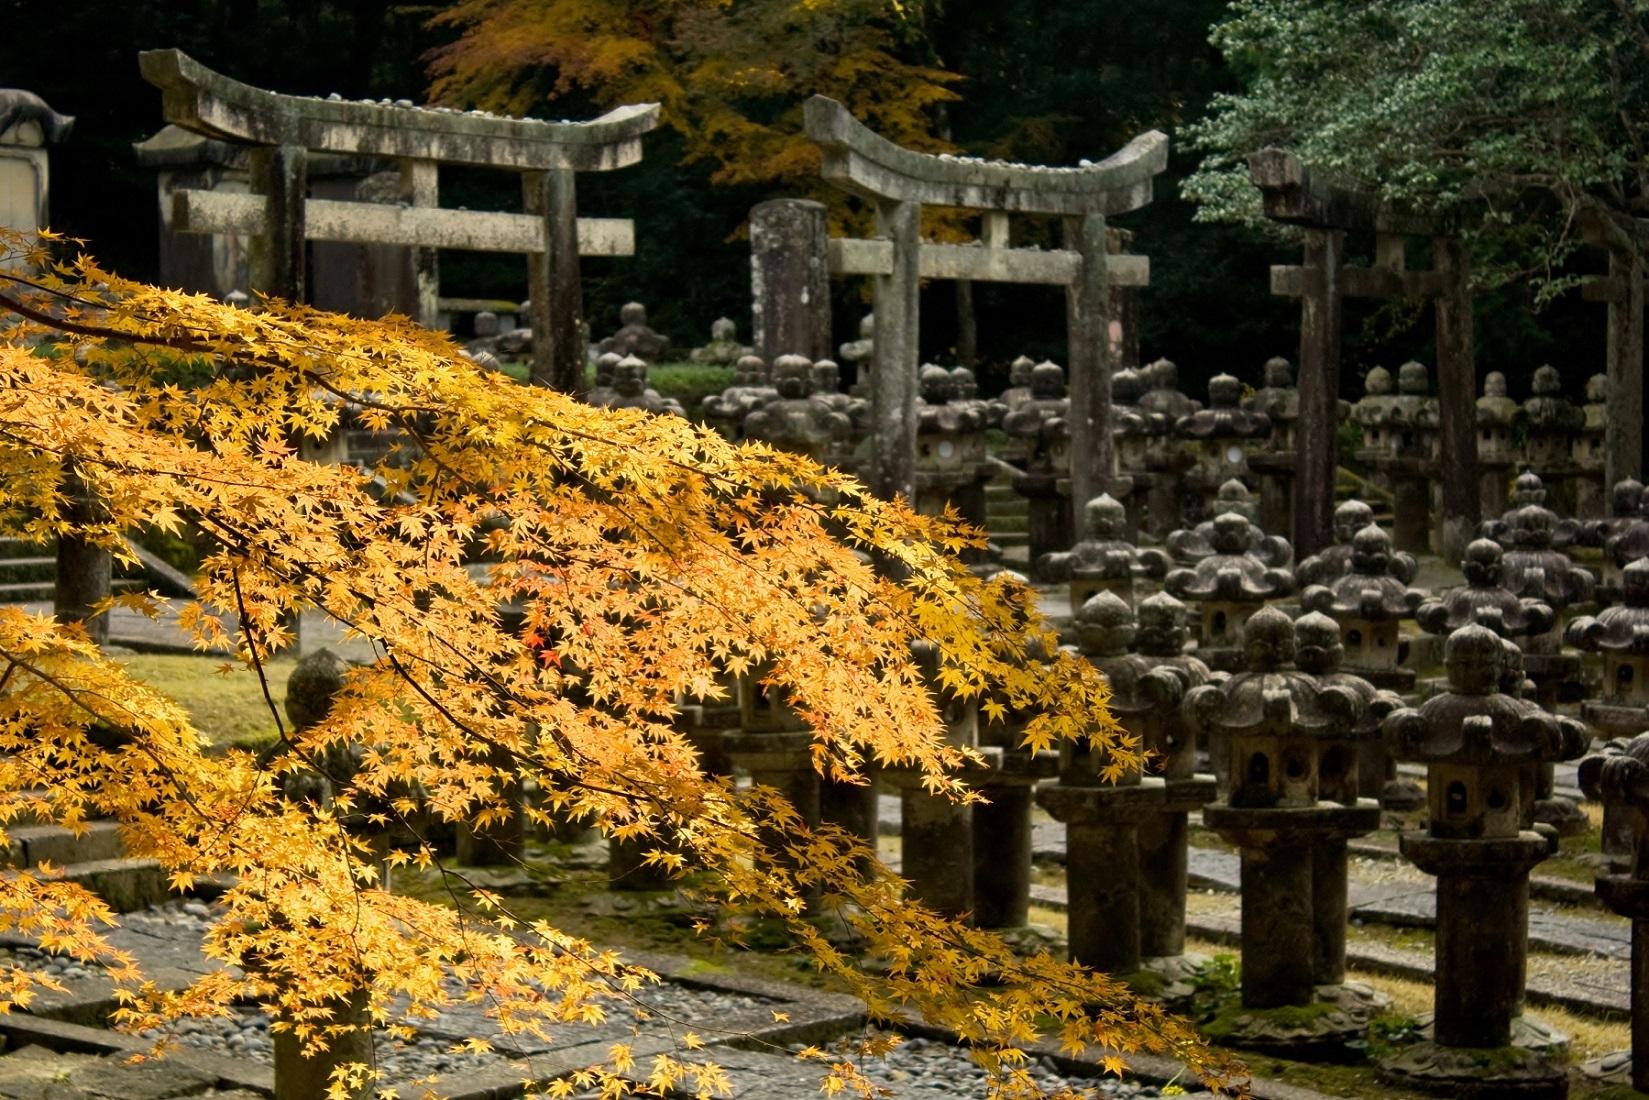 8. Tokoji Temple